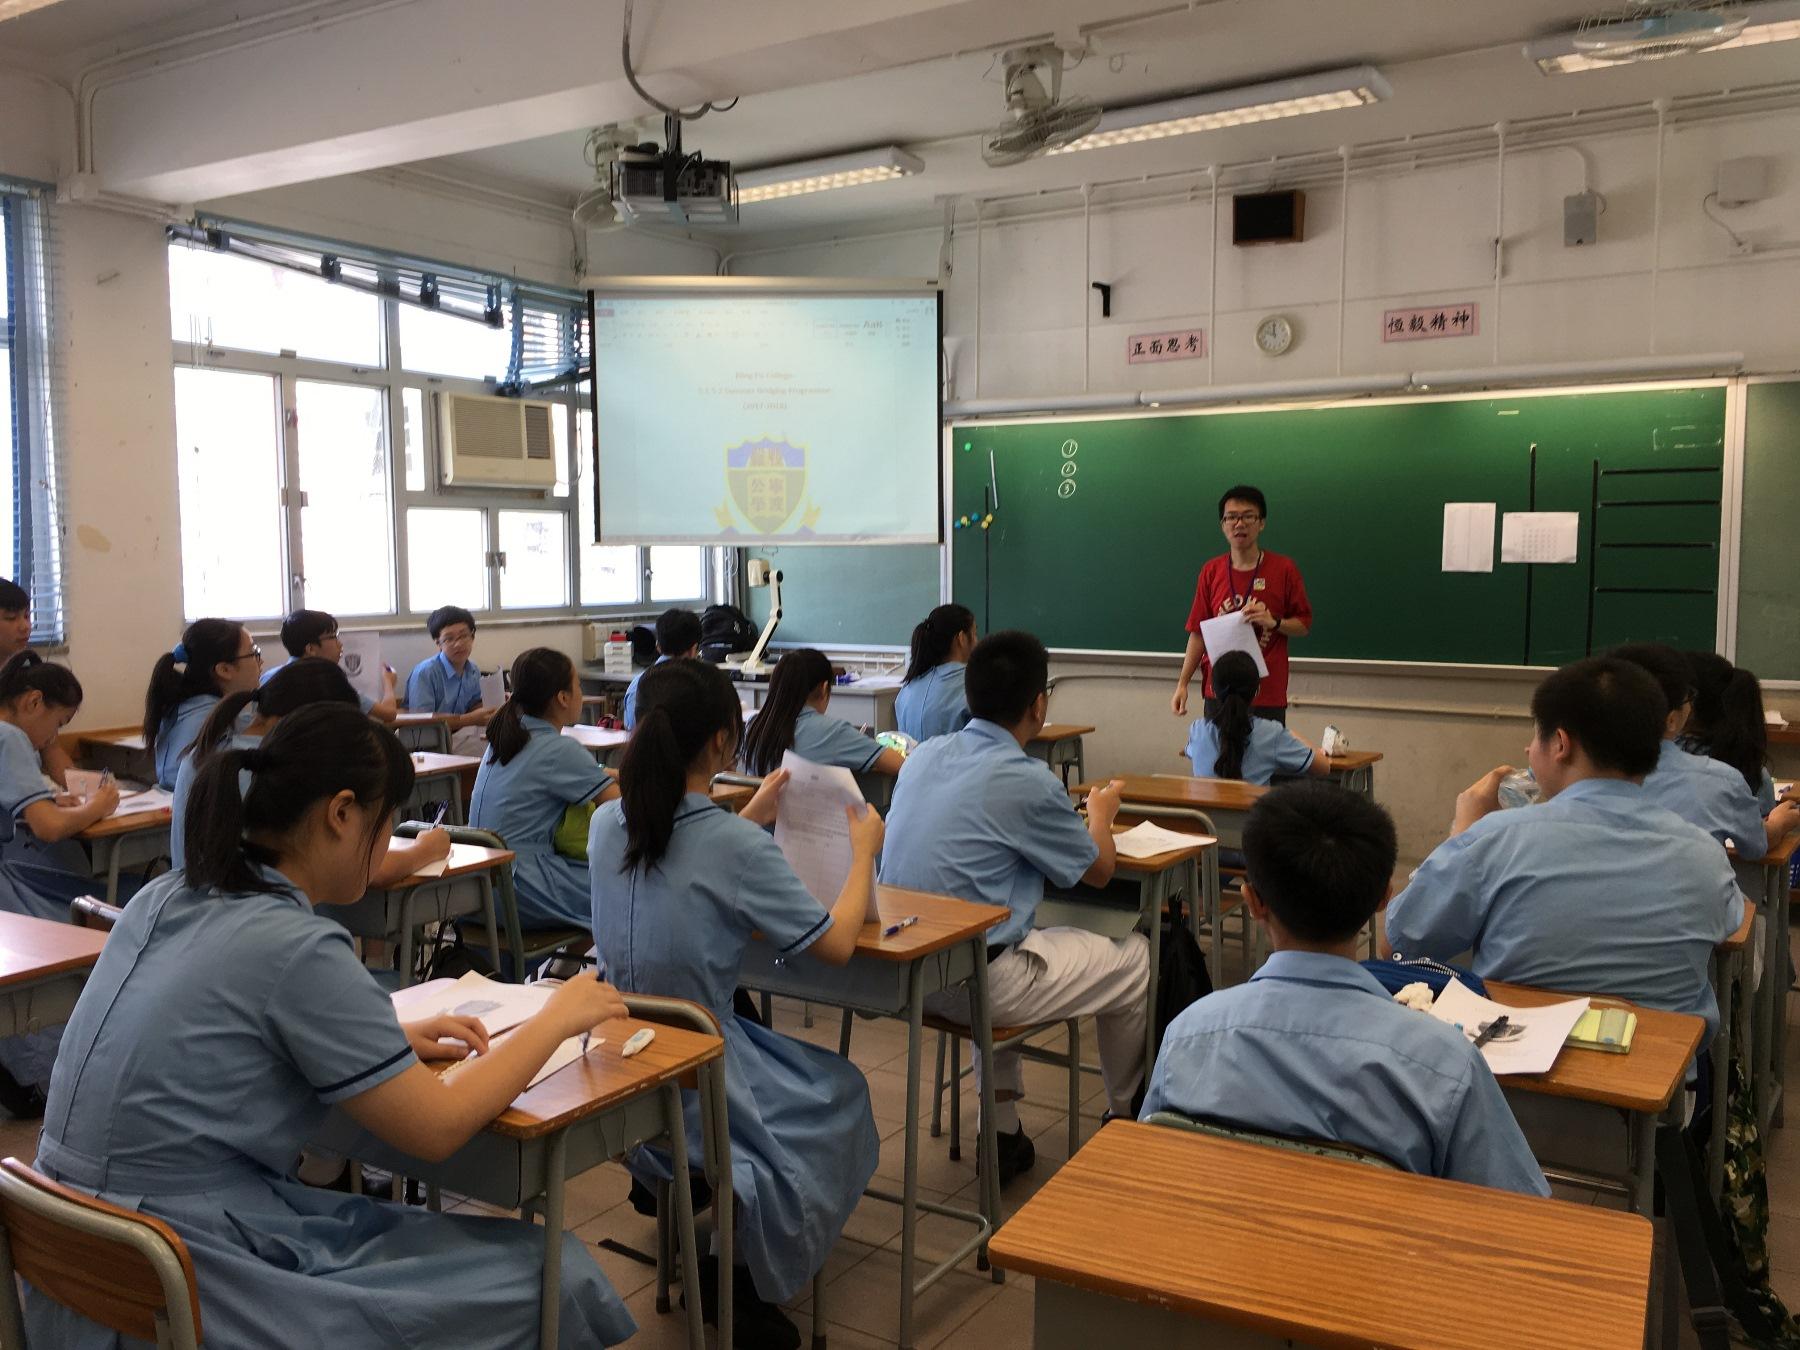 http://www.npc.edu.hk/sites/default/files/img_1009.jpg